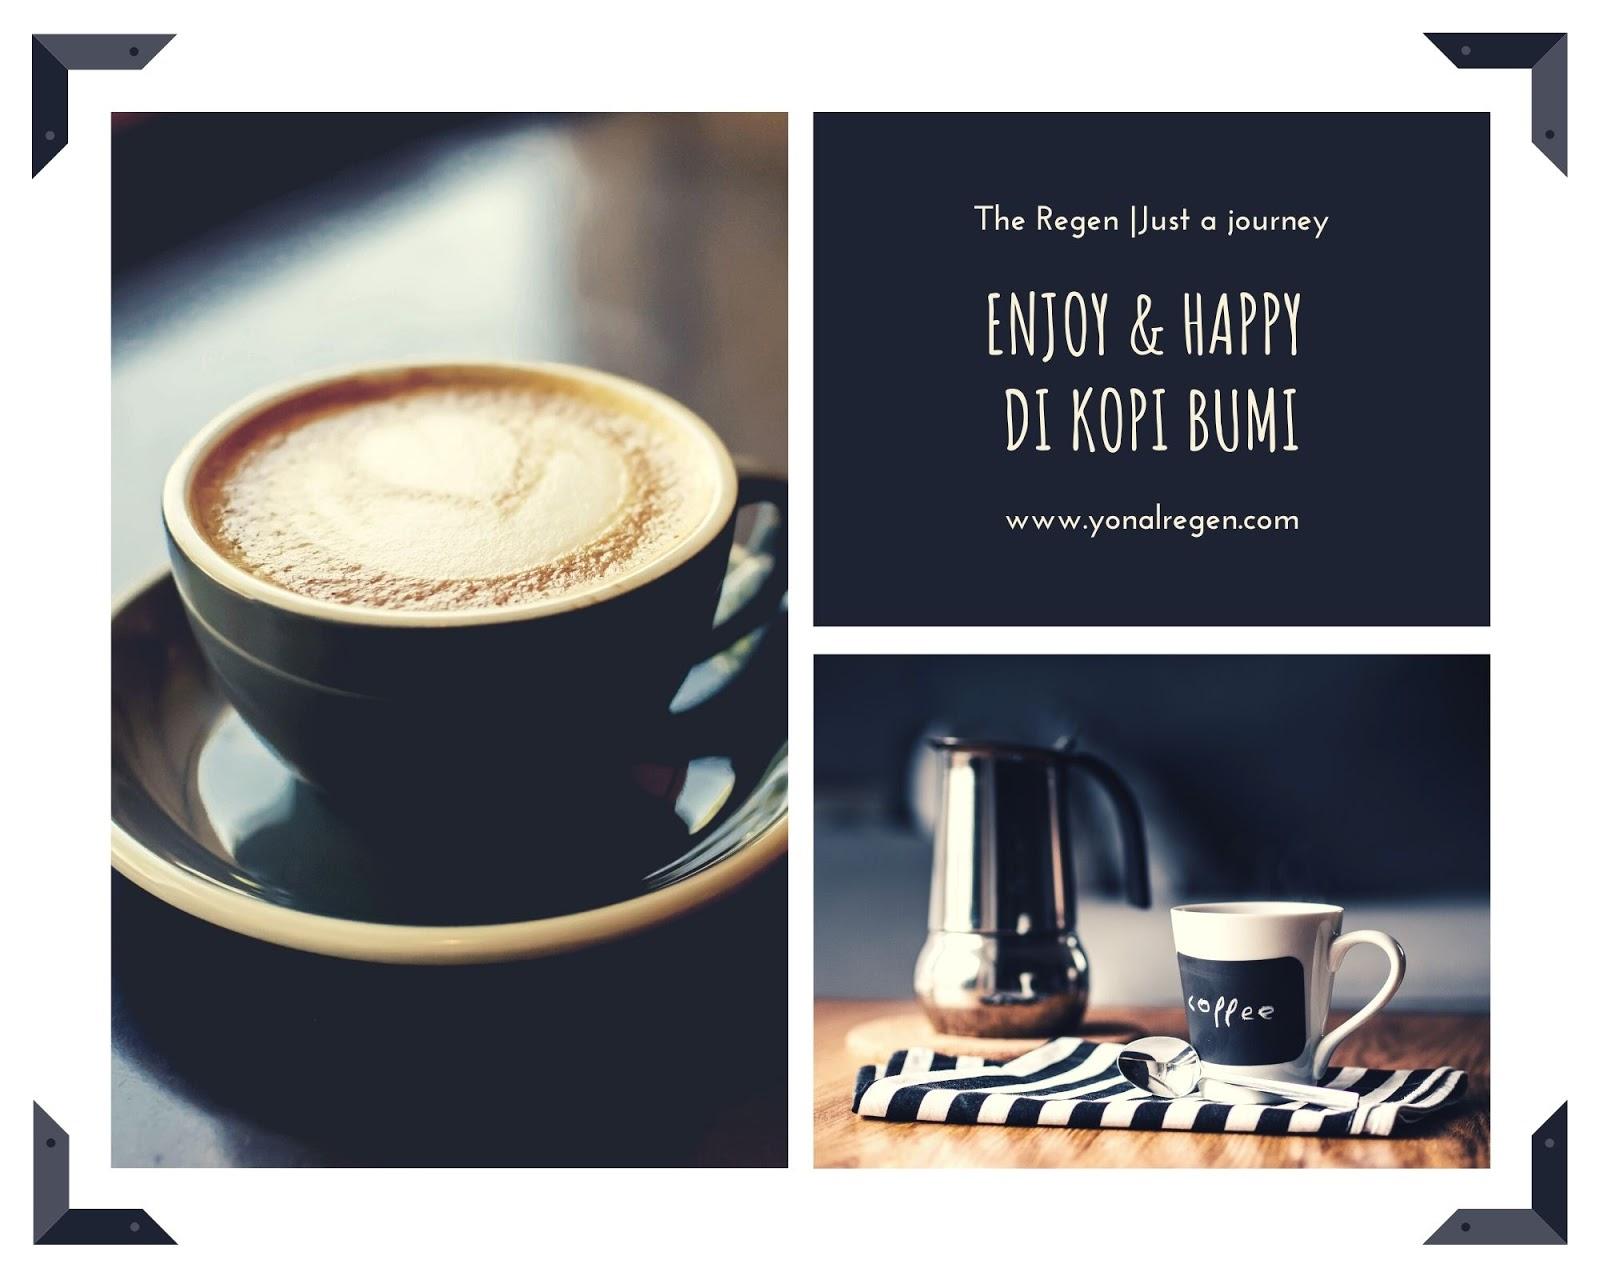 enjoy & happy di kopi bumi Sukabumi